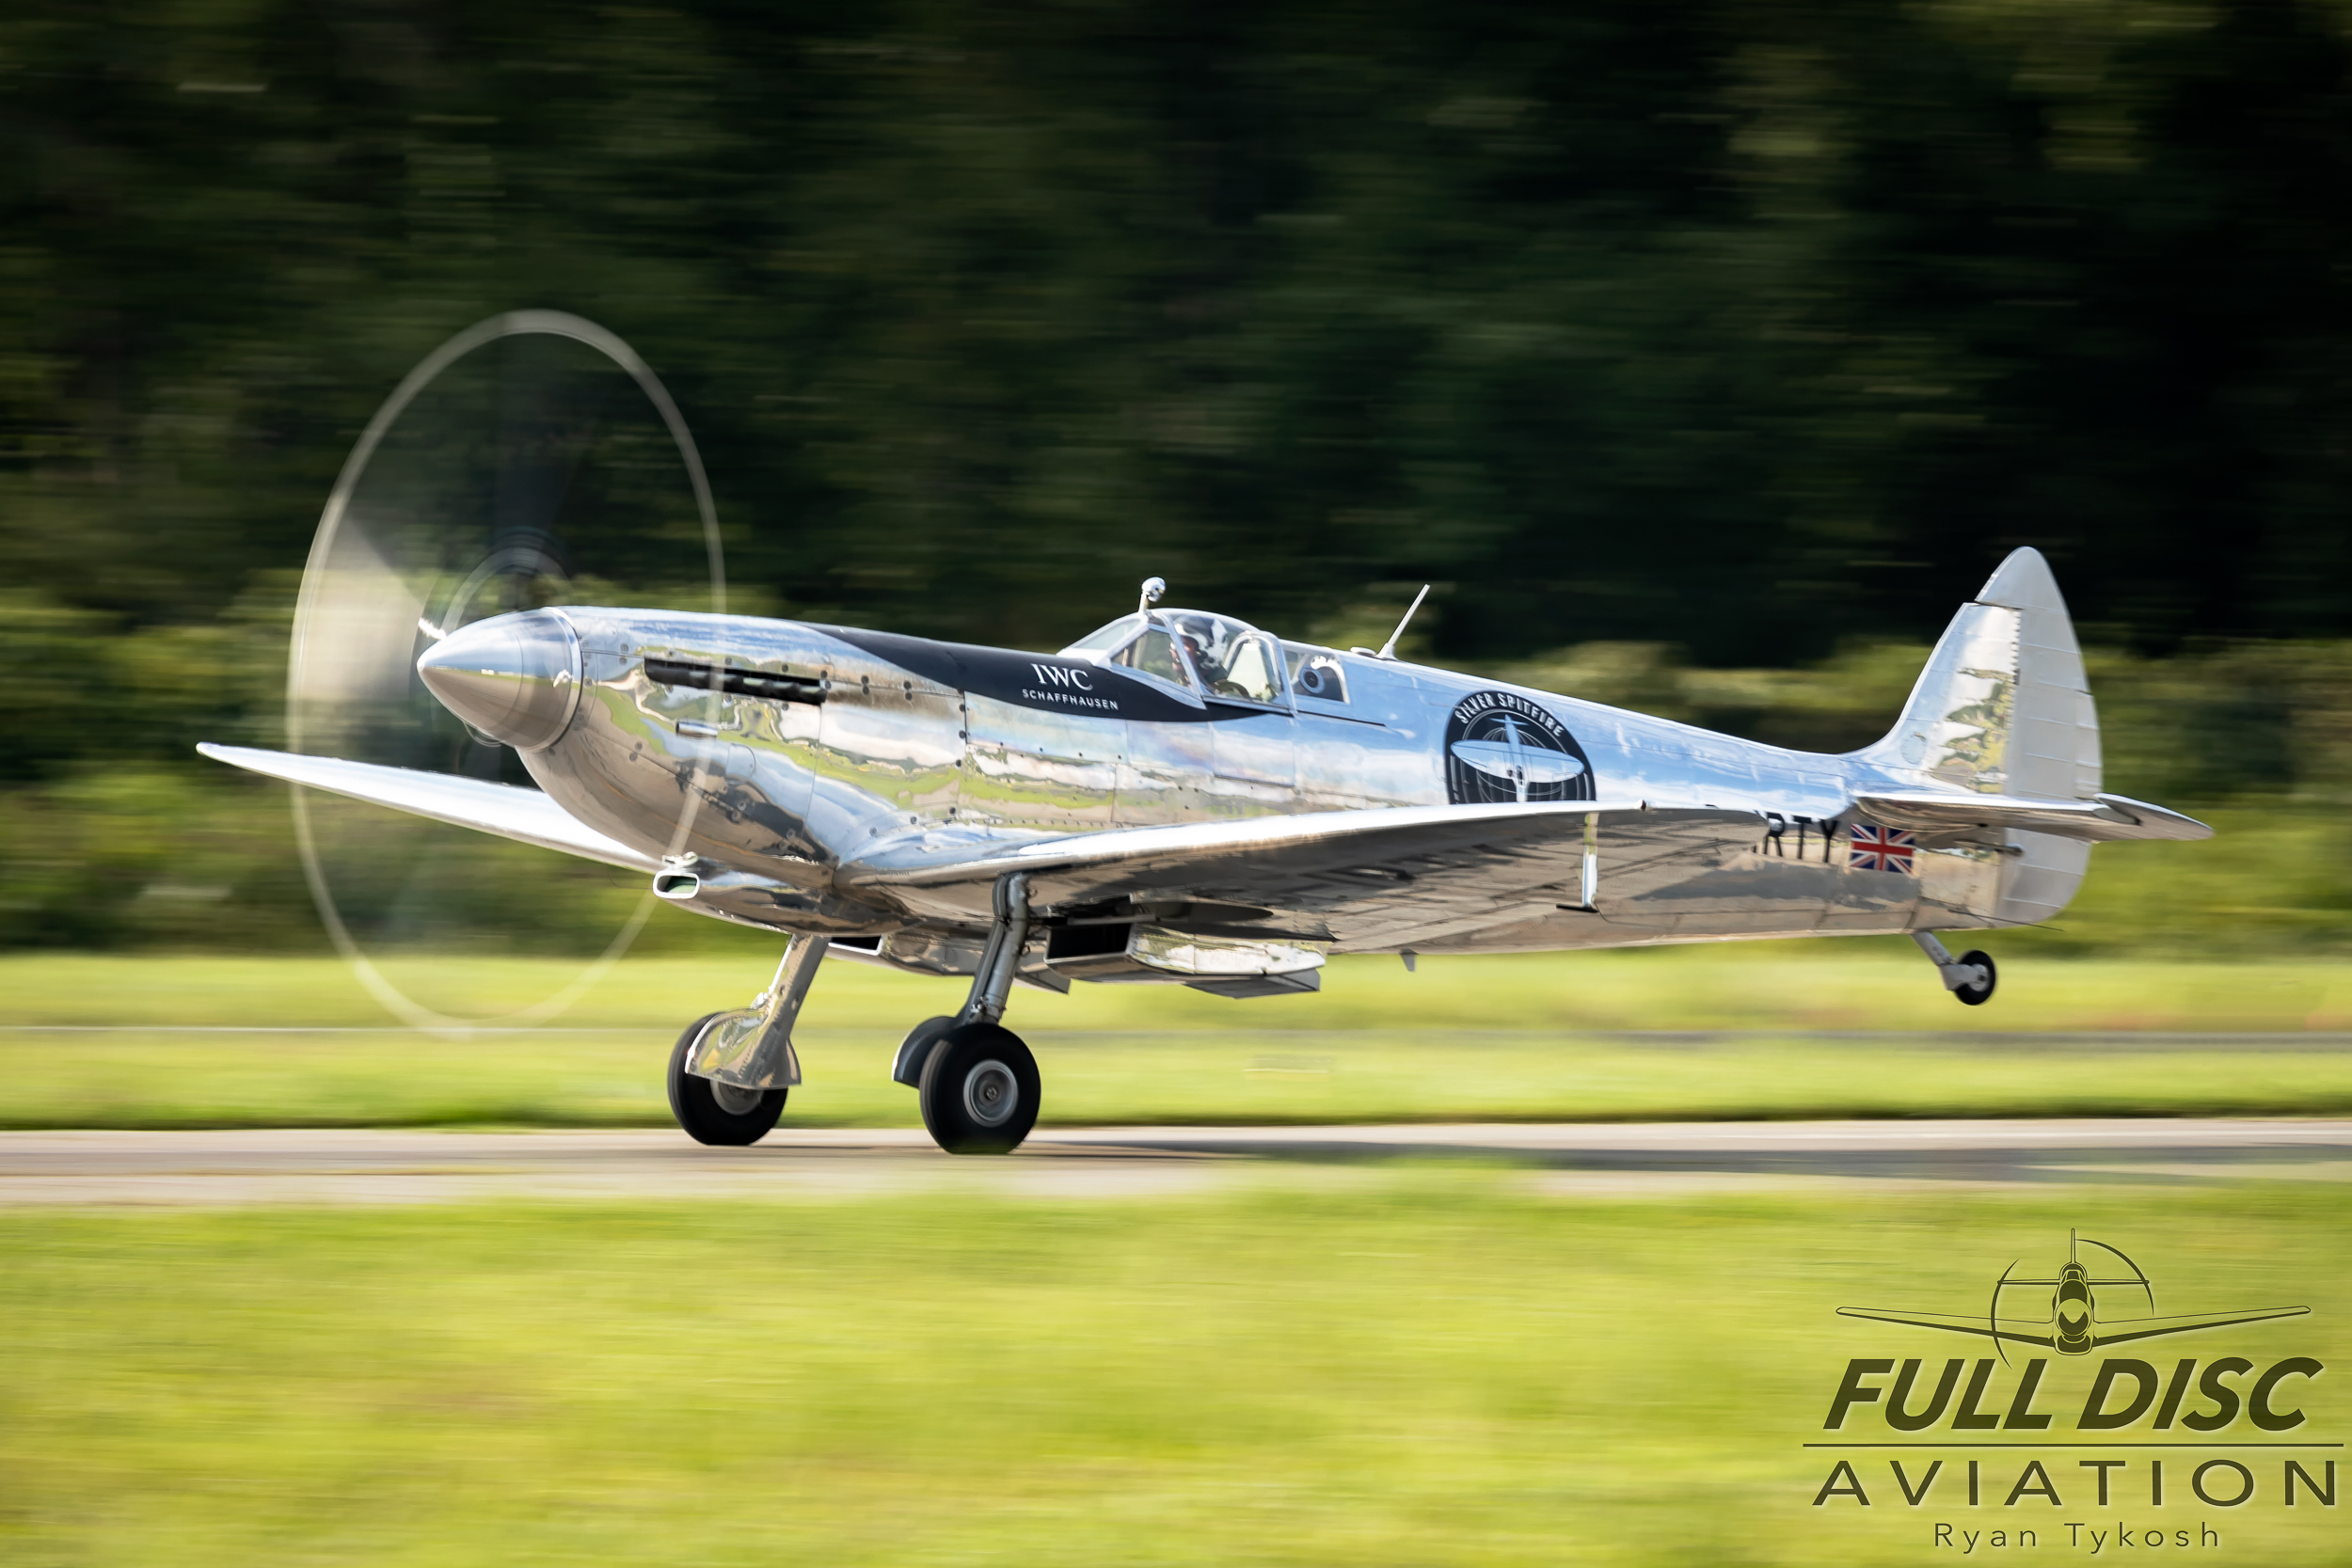 Silver Spitfire - Full Disc Aviation - Ryan Tykosh_August 21, 2019_07.jpg